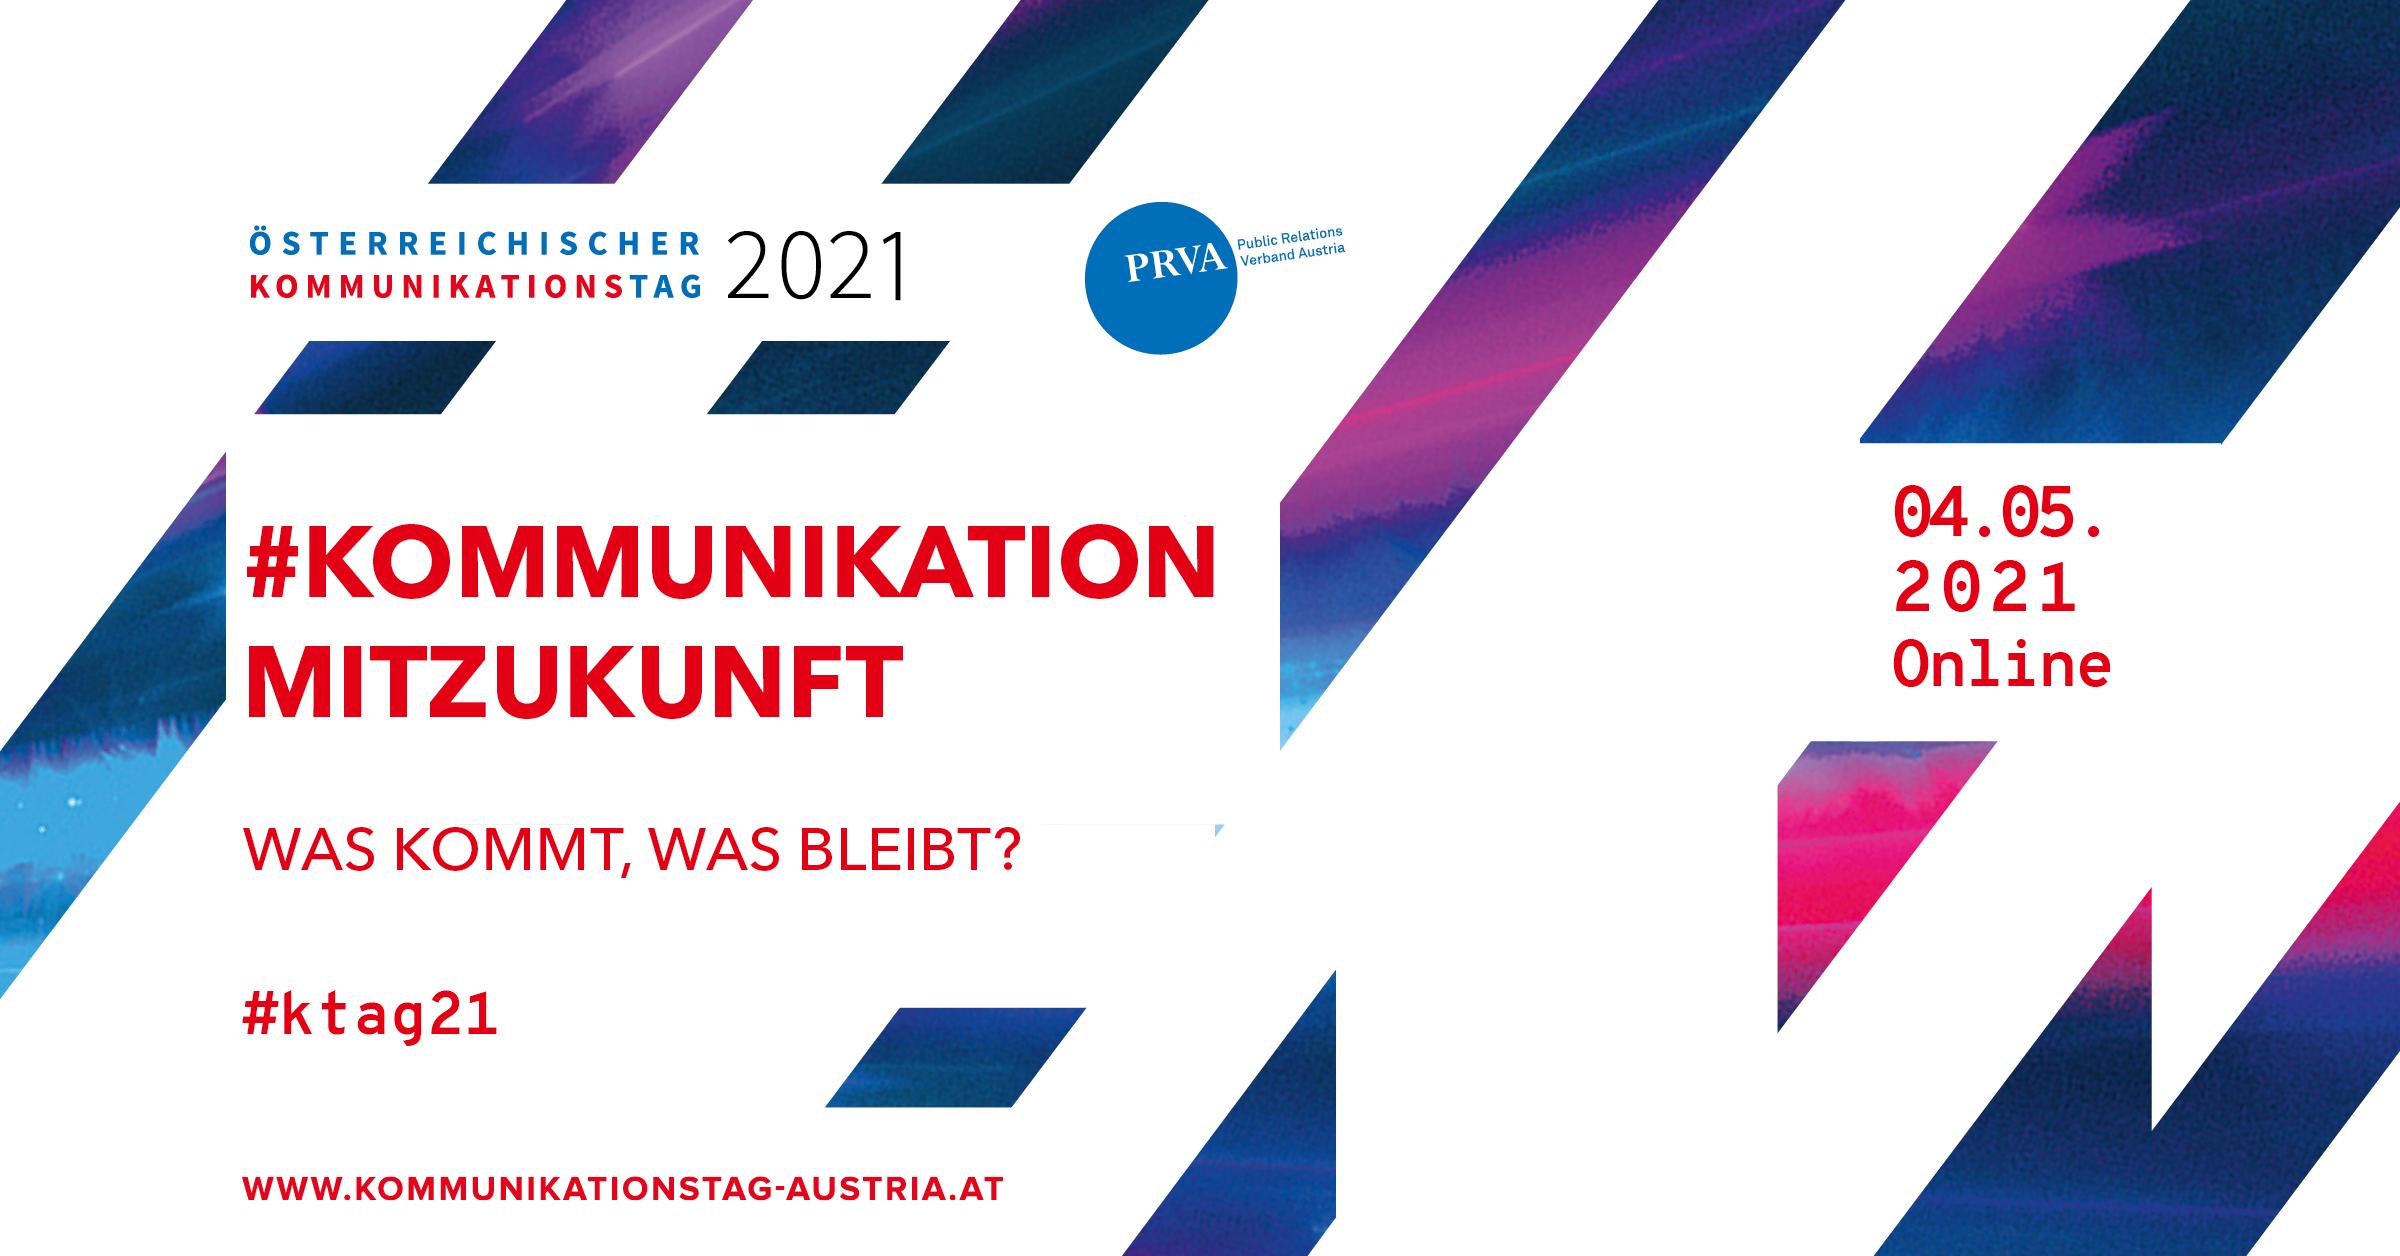 #ktag21 #KommunikationmitZukunft